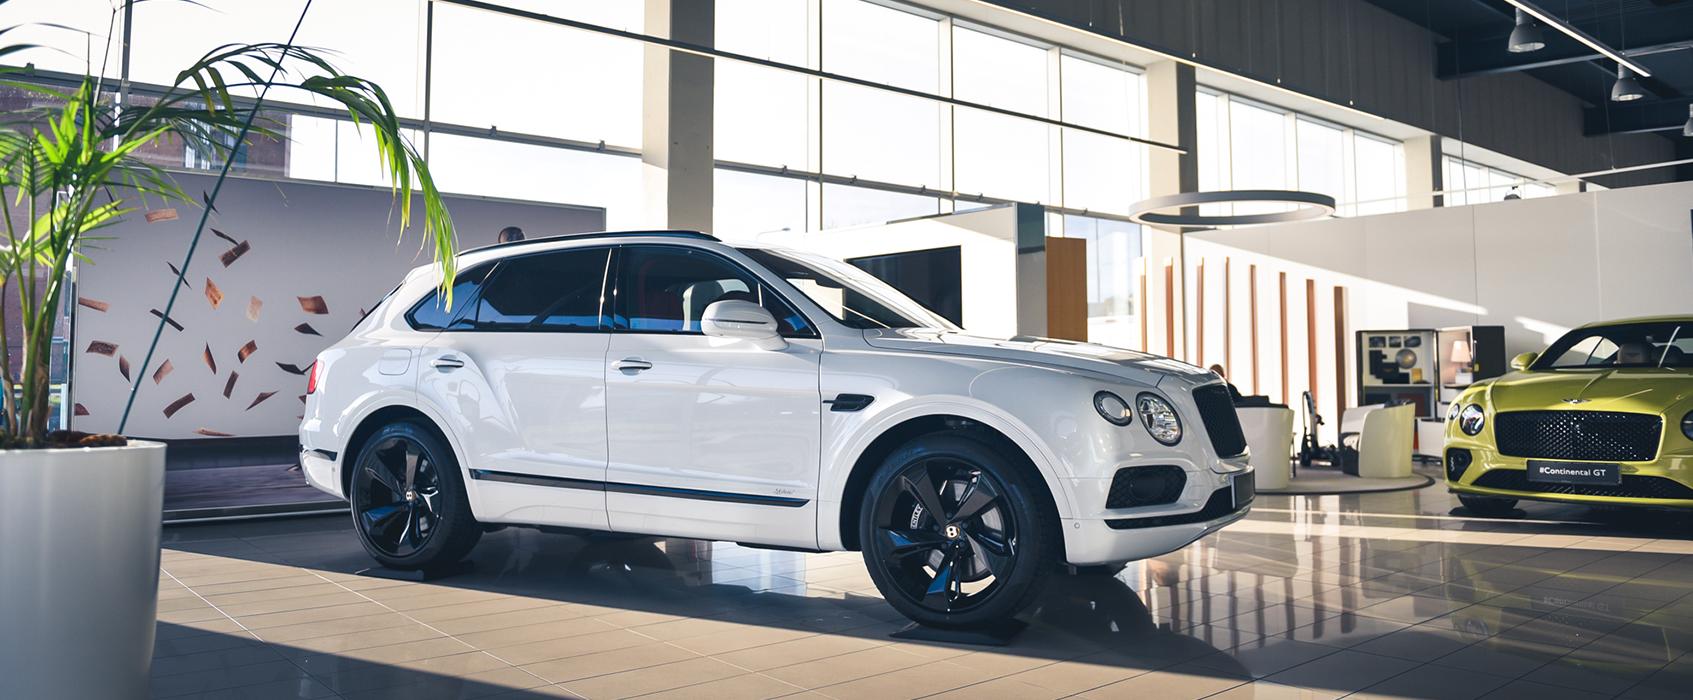 Bentayga Hybrid Bentley namuose Vilniuje